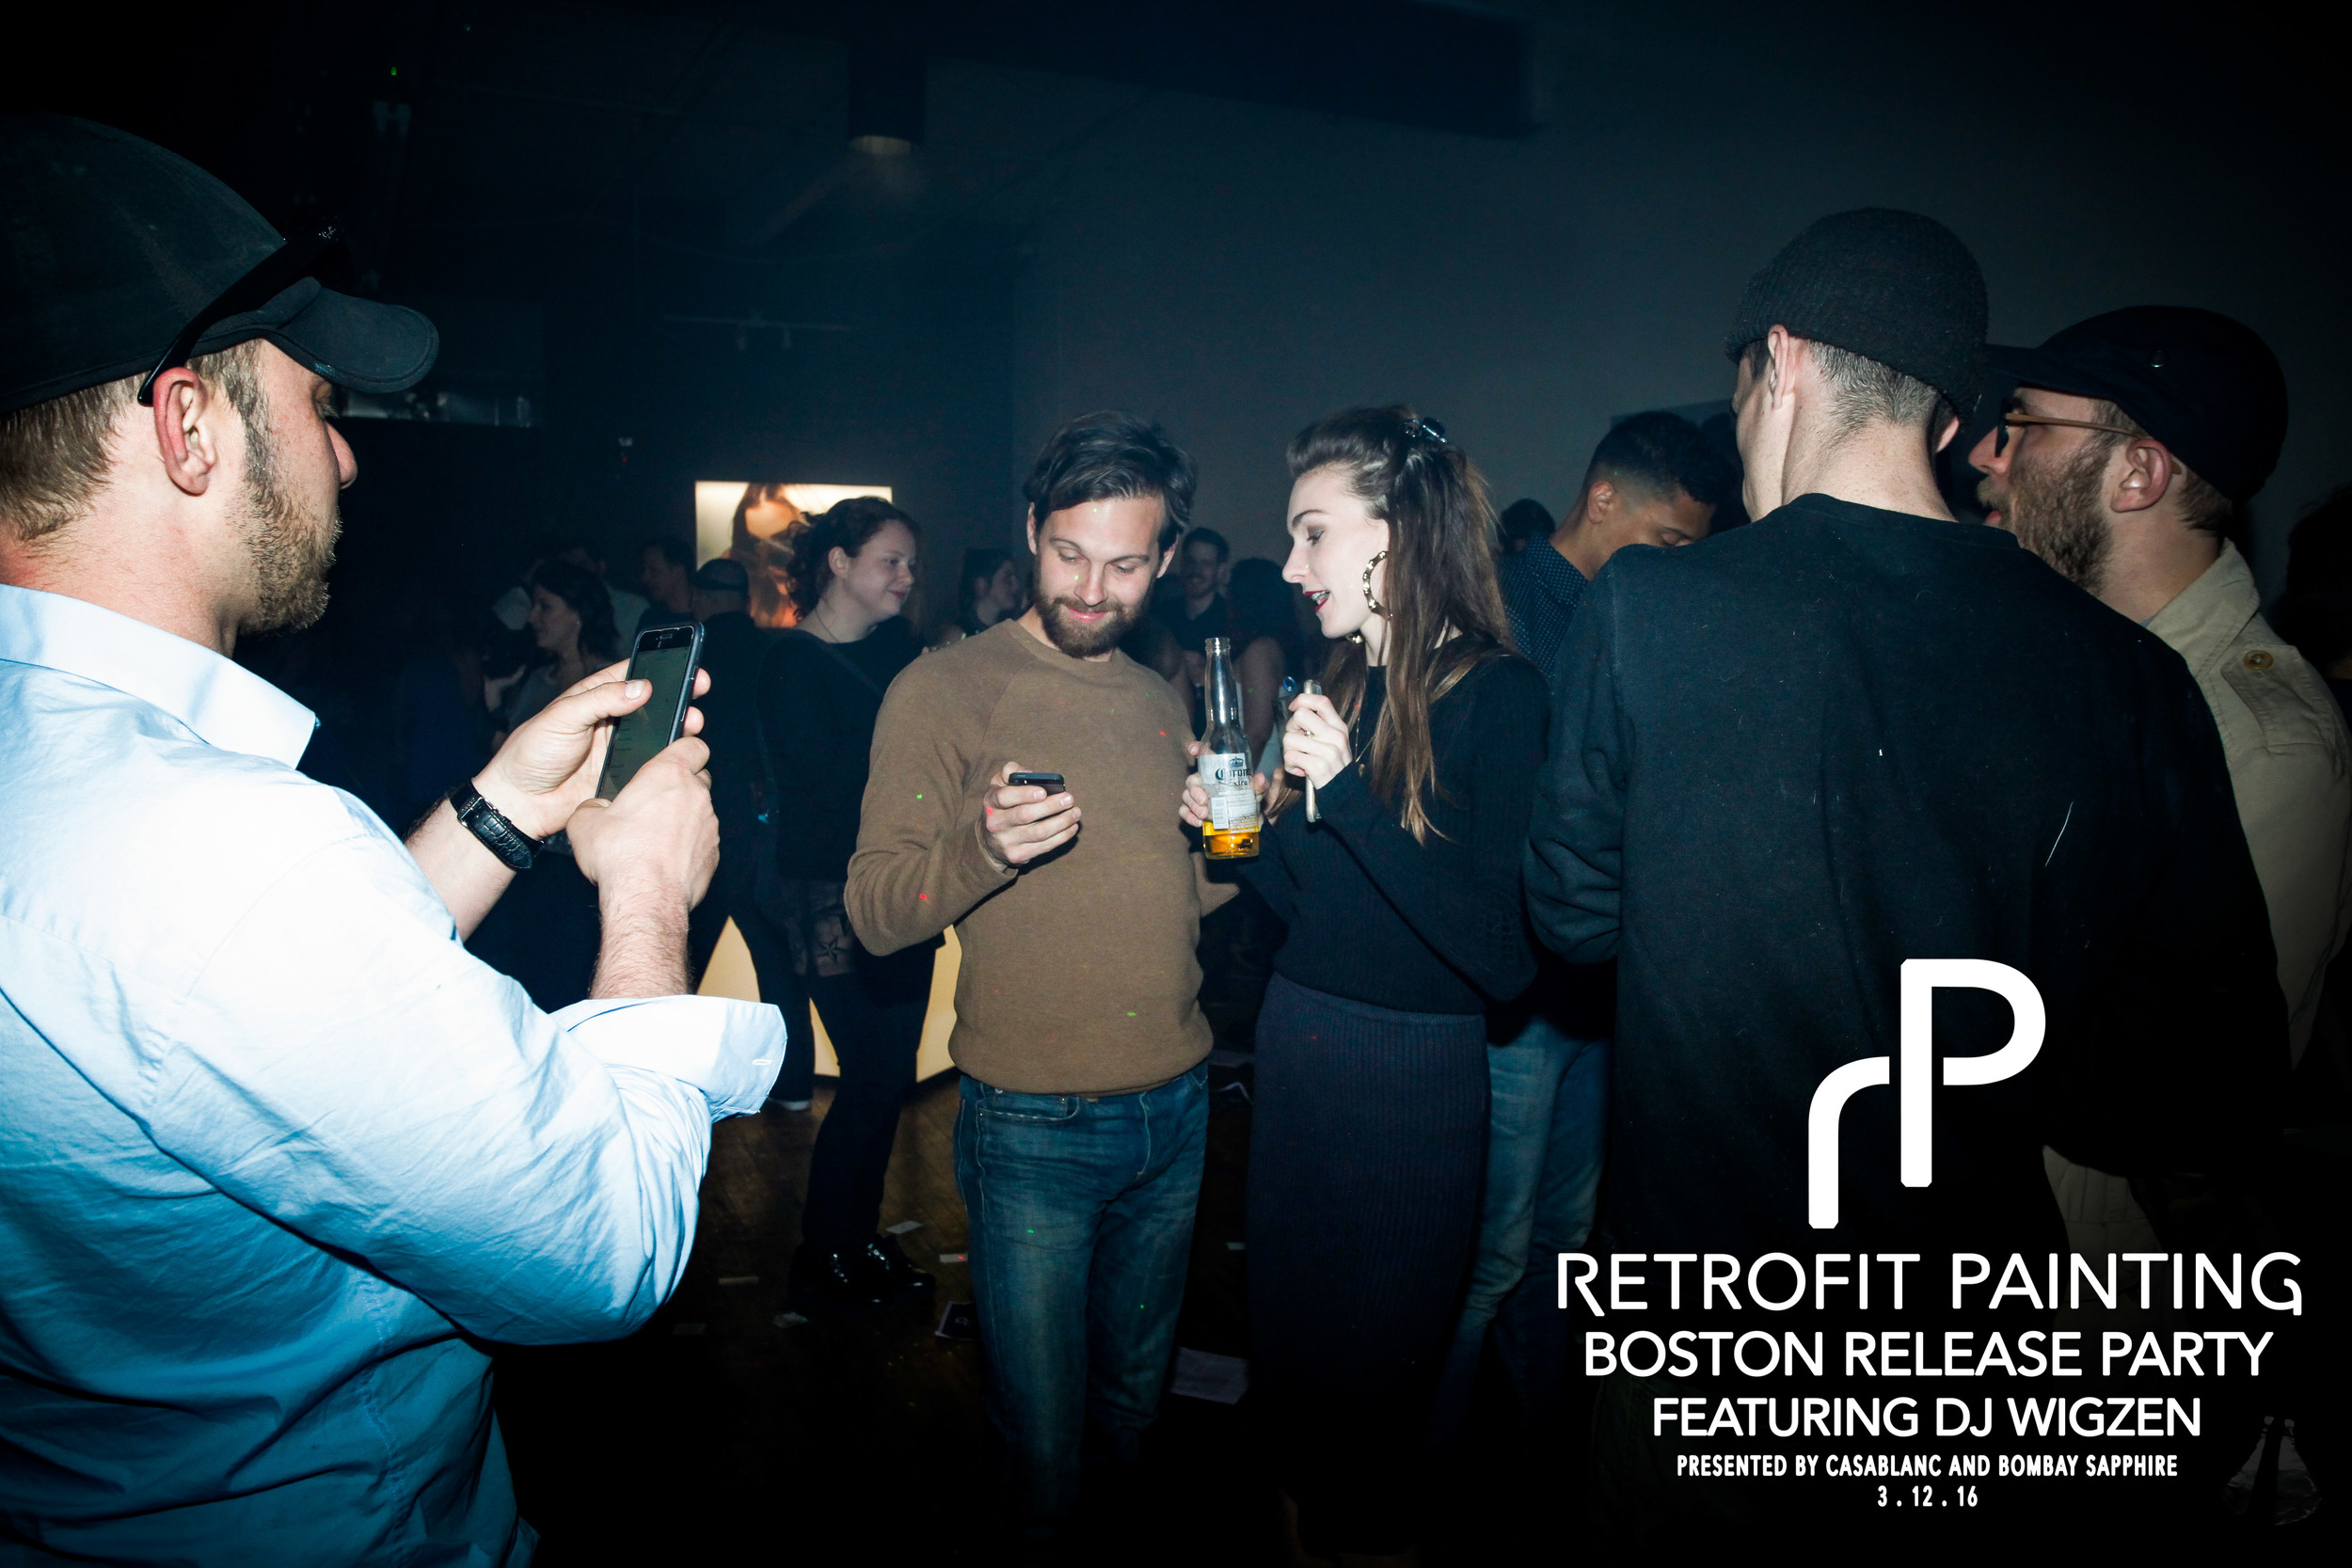 Retrofit Painting Boston Release Party 0084.jpg